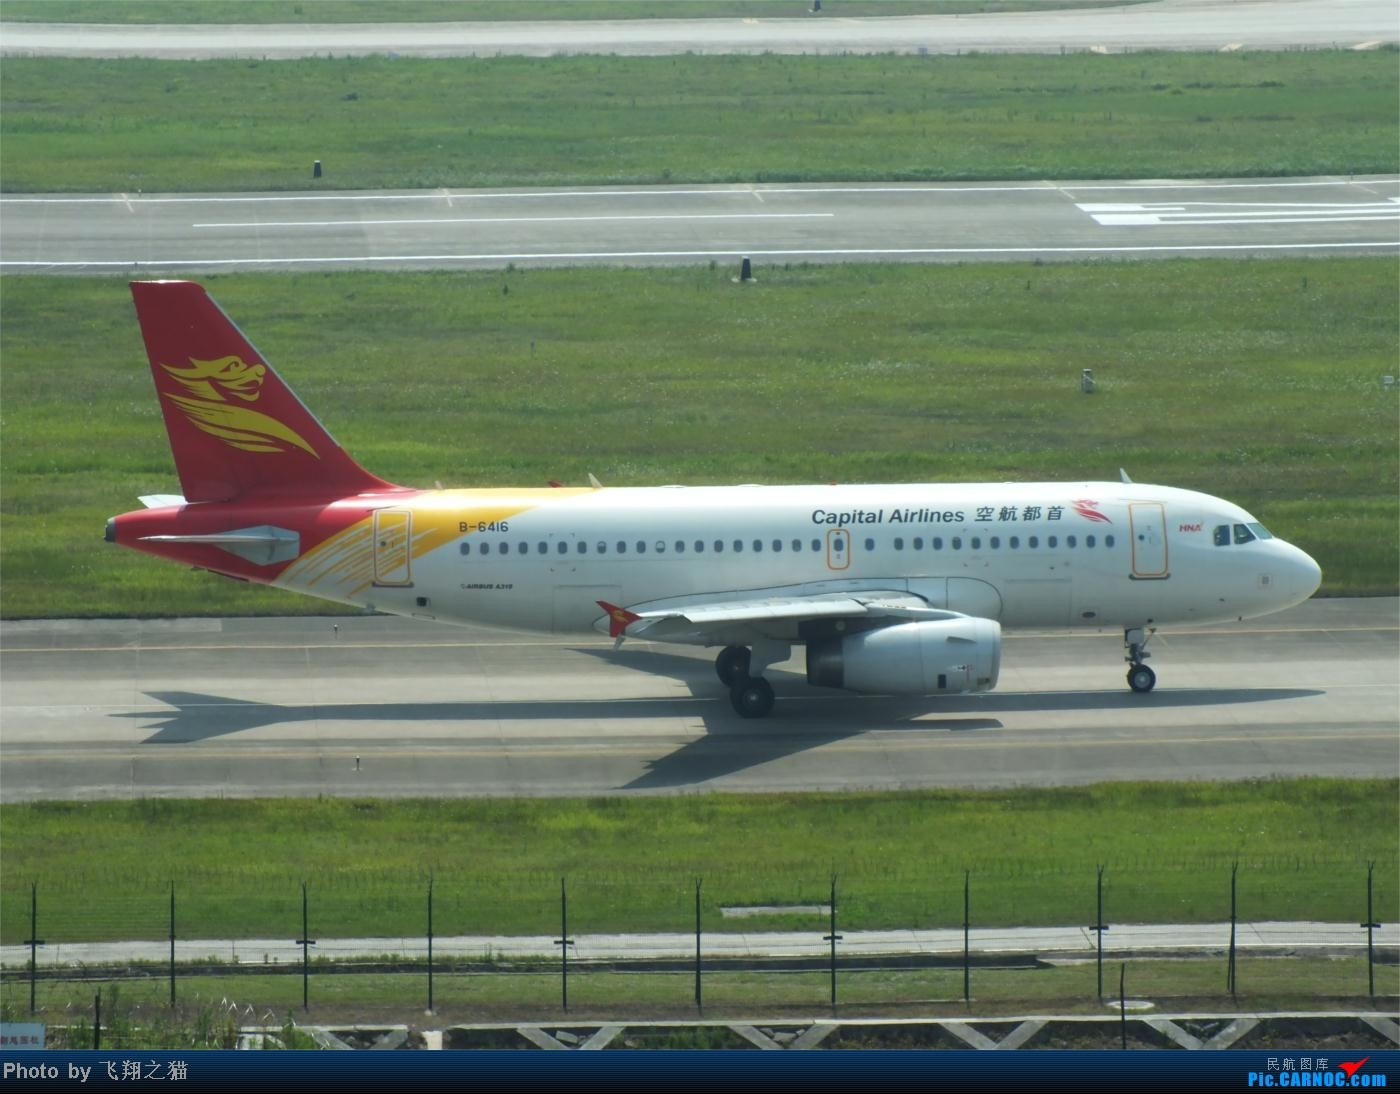 Re:[原创]烈日当空,坚持拍机(南航777F,332,大运号,花博号等) AIRBUS A319 B-6416 重庆江北国际机场